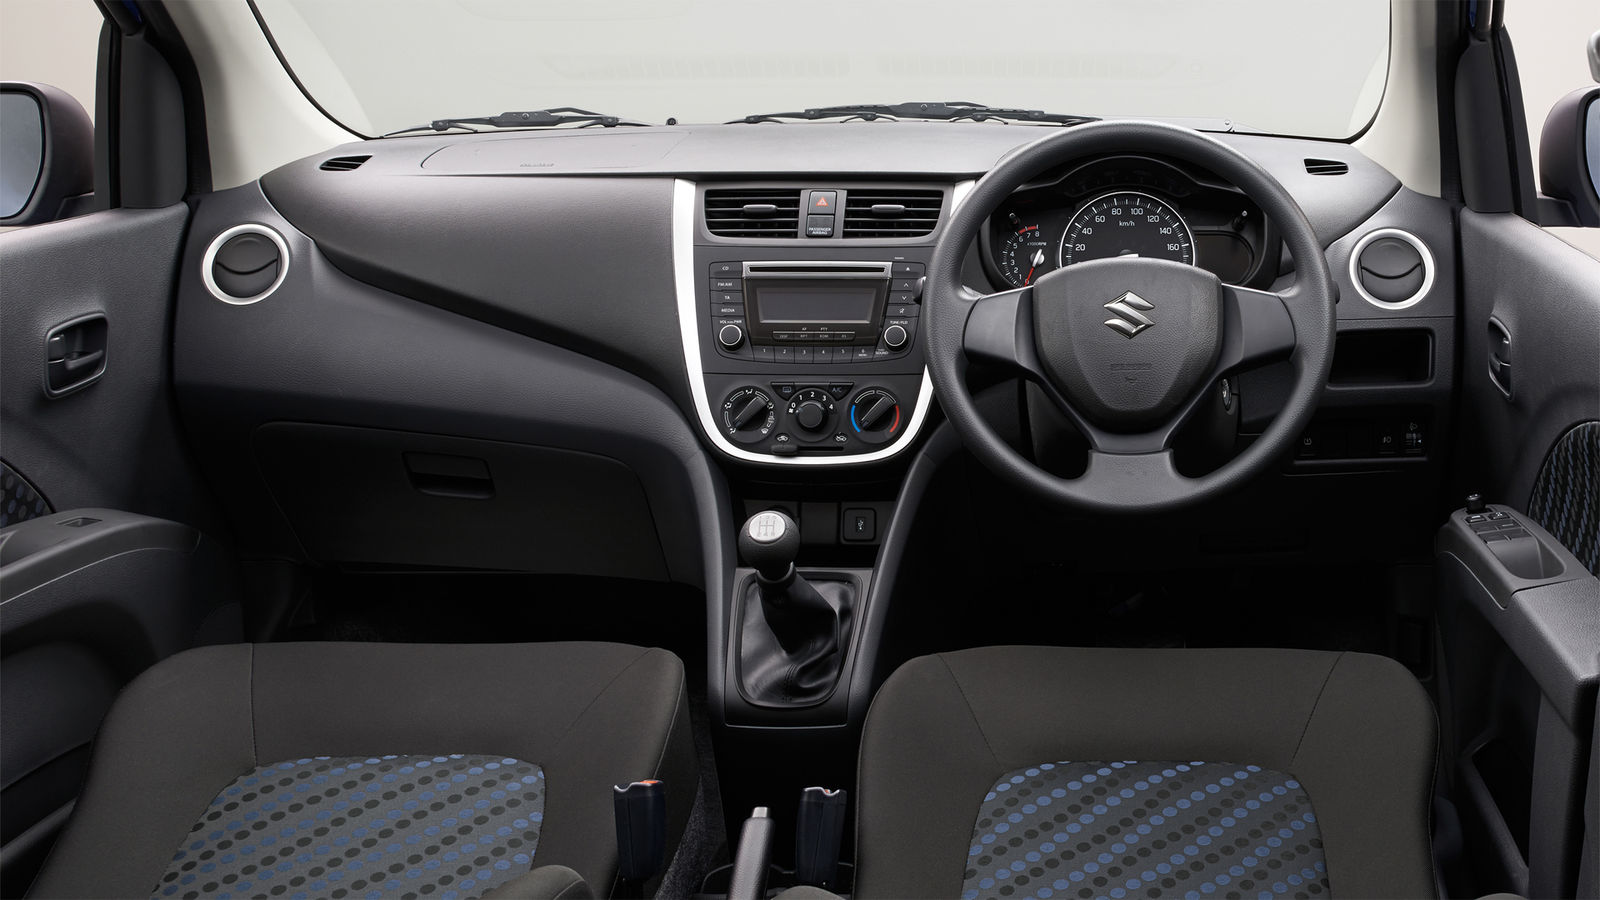 2015 Suzuki Celerio city car | carwow